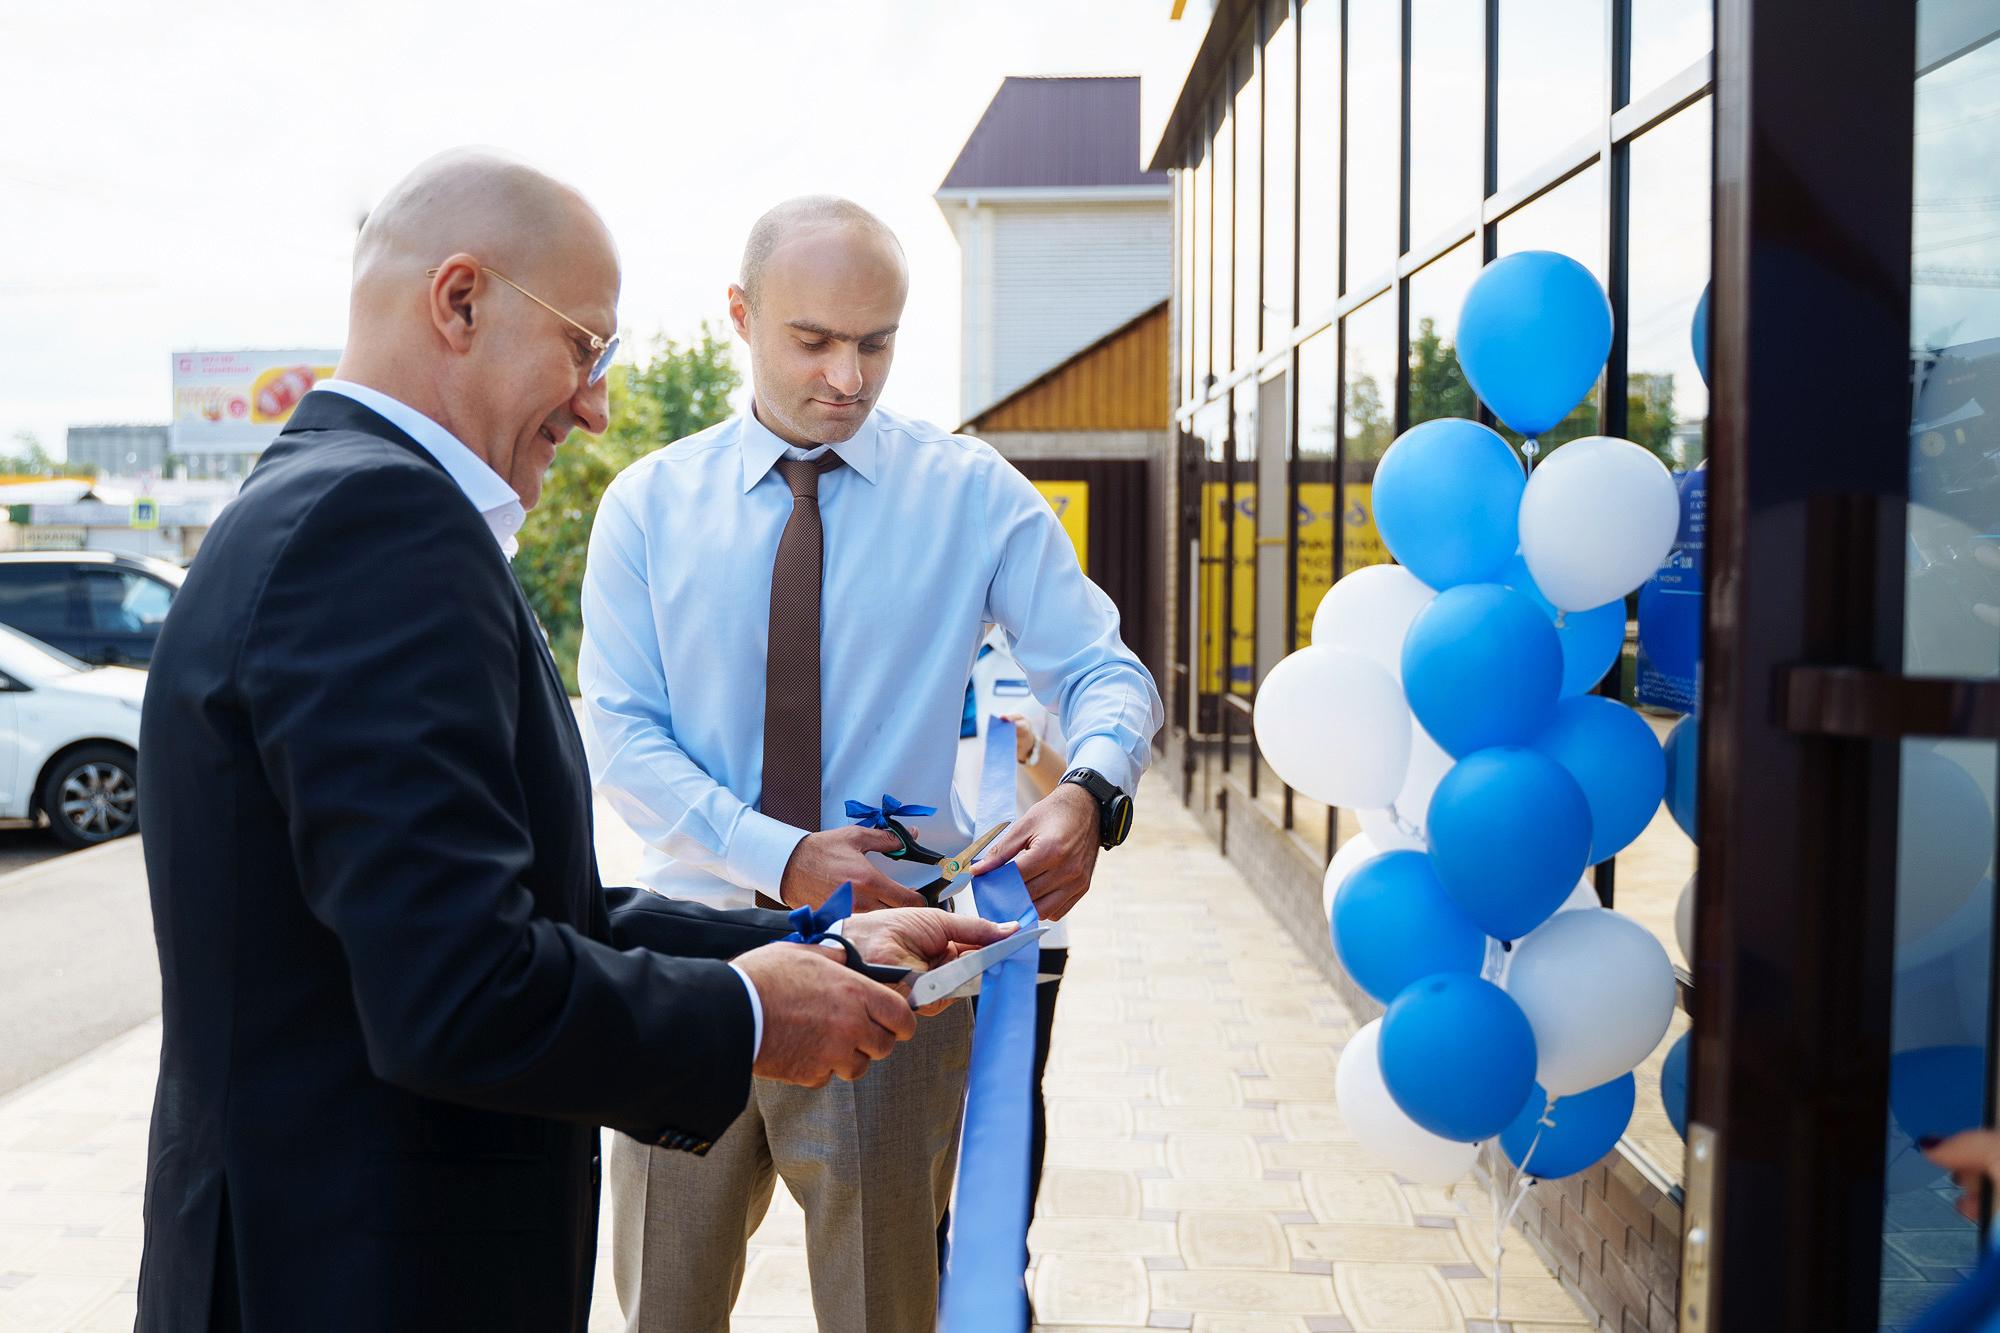 img 021 ВТБ открыл офис нового формата в Астрахани